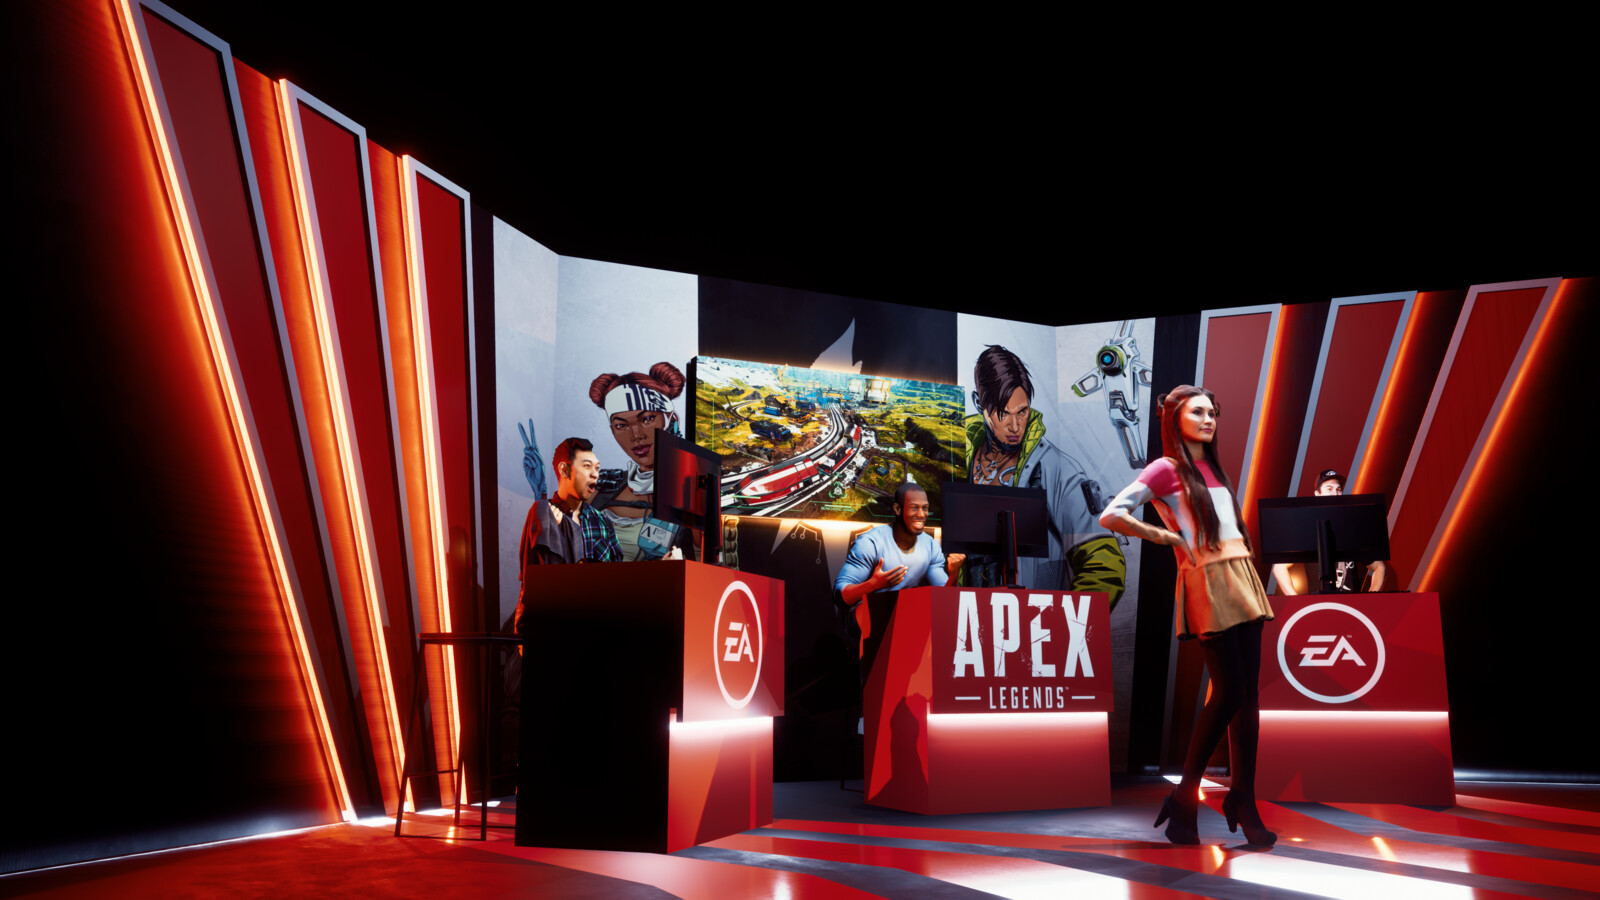 Apex Legends Studio Setup Design